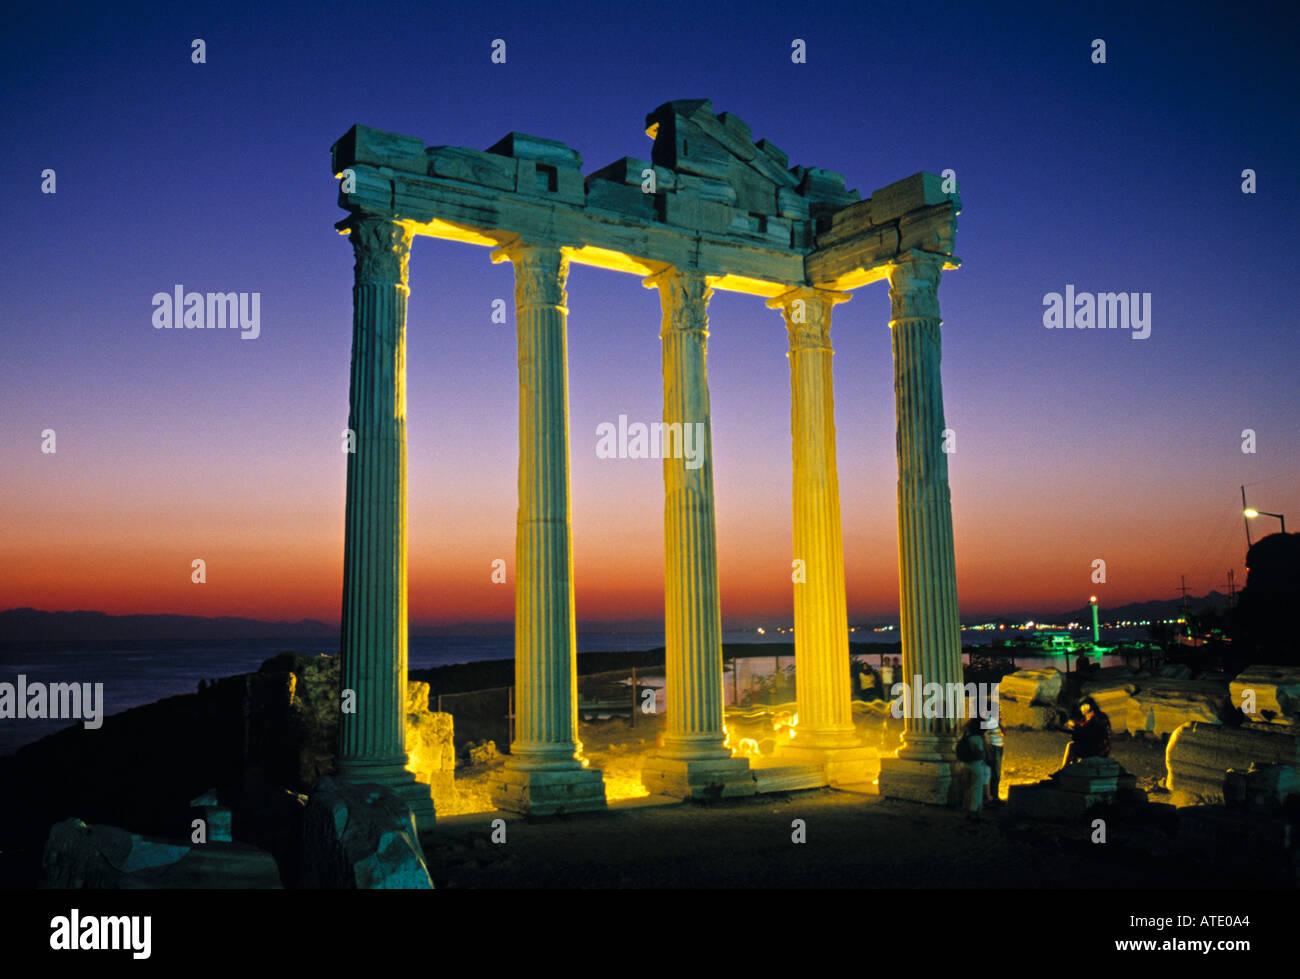 Tempel des Apollo, Side, Türkei Stockbild